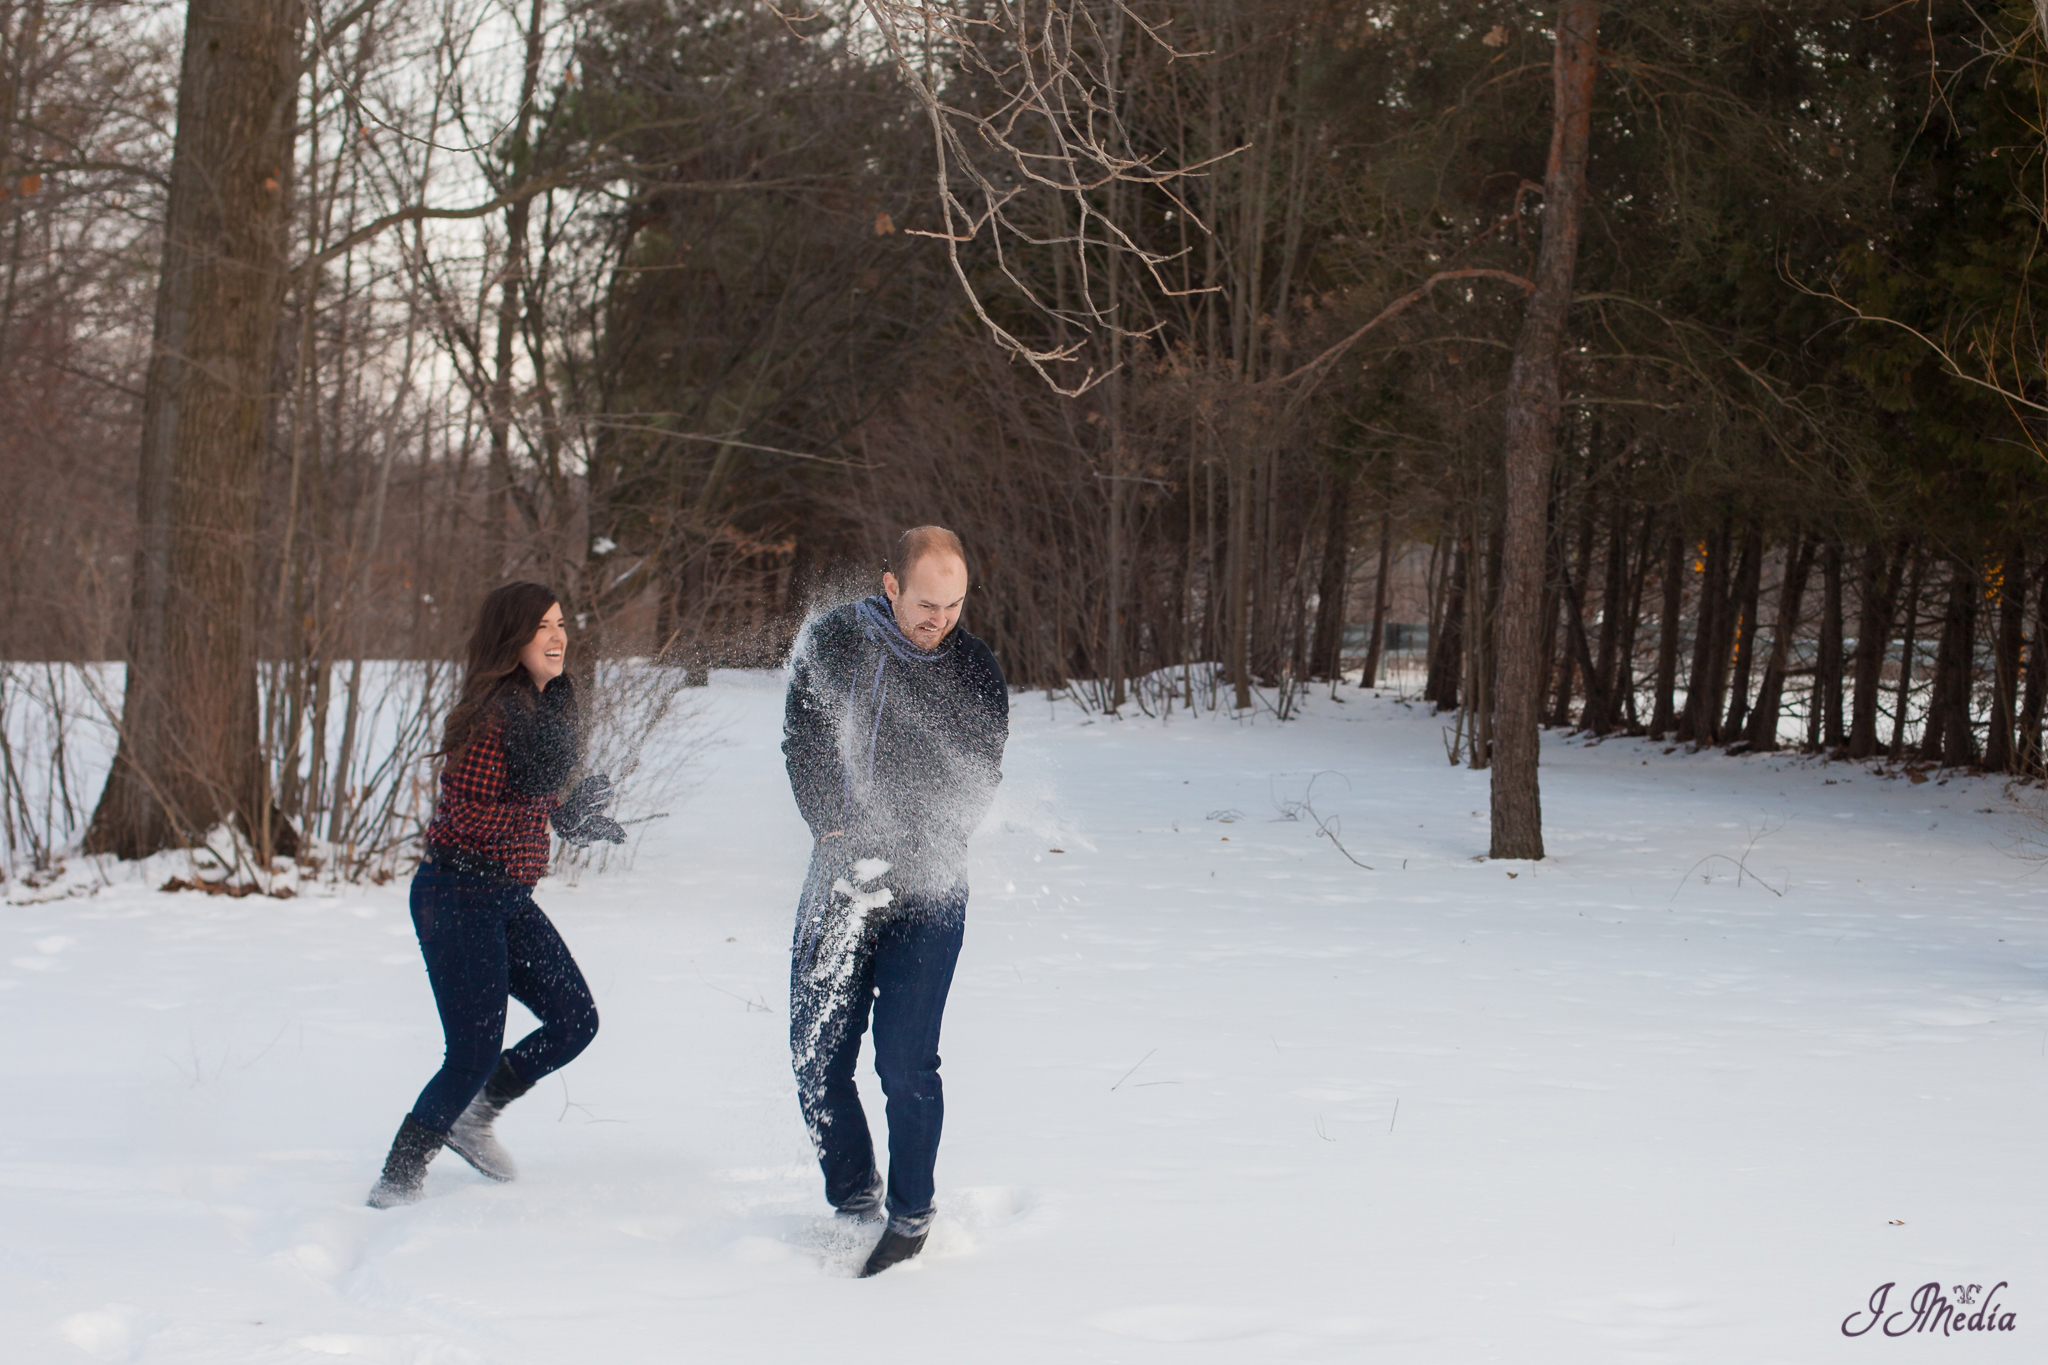 Winter-Engagement-Photos-JJMedia-39